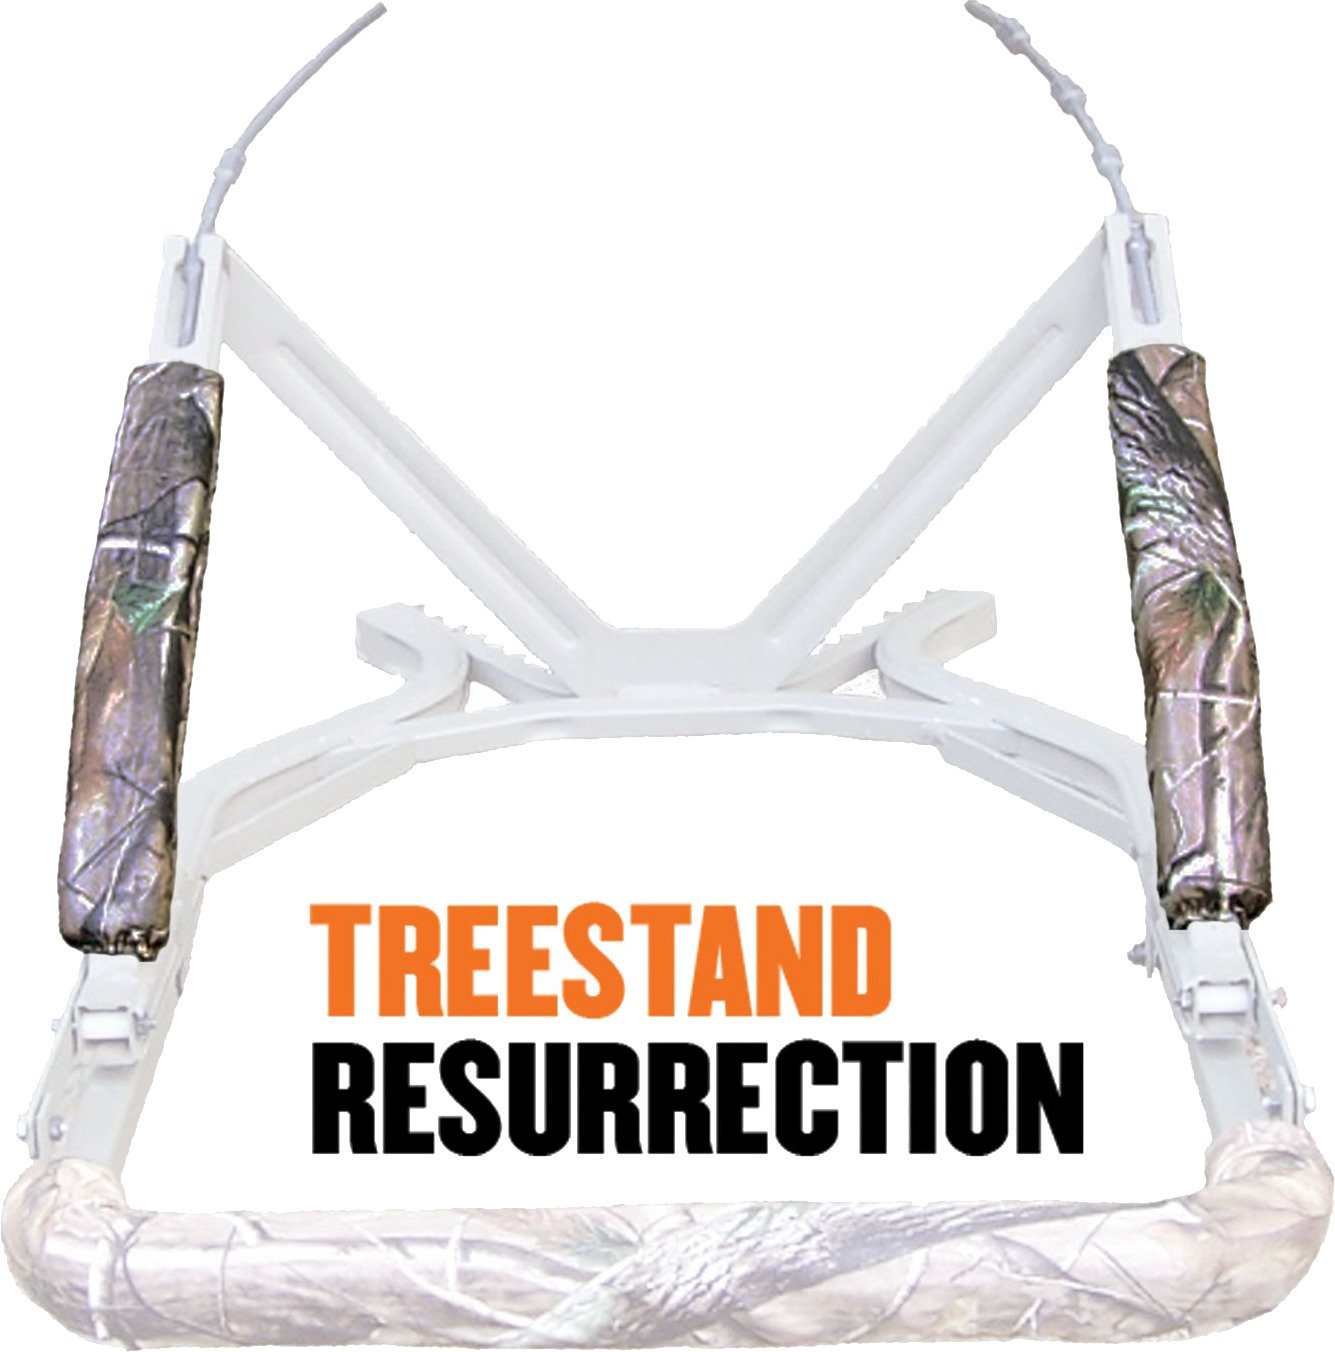 Cottonwood Outdoors Weathershield Treestand Resurrection 15